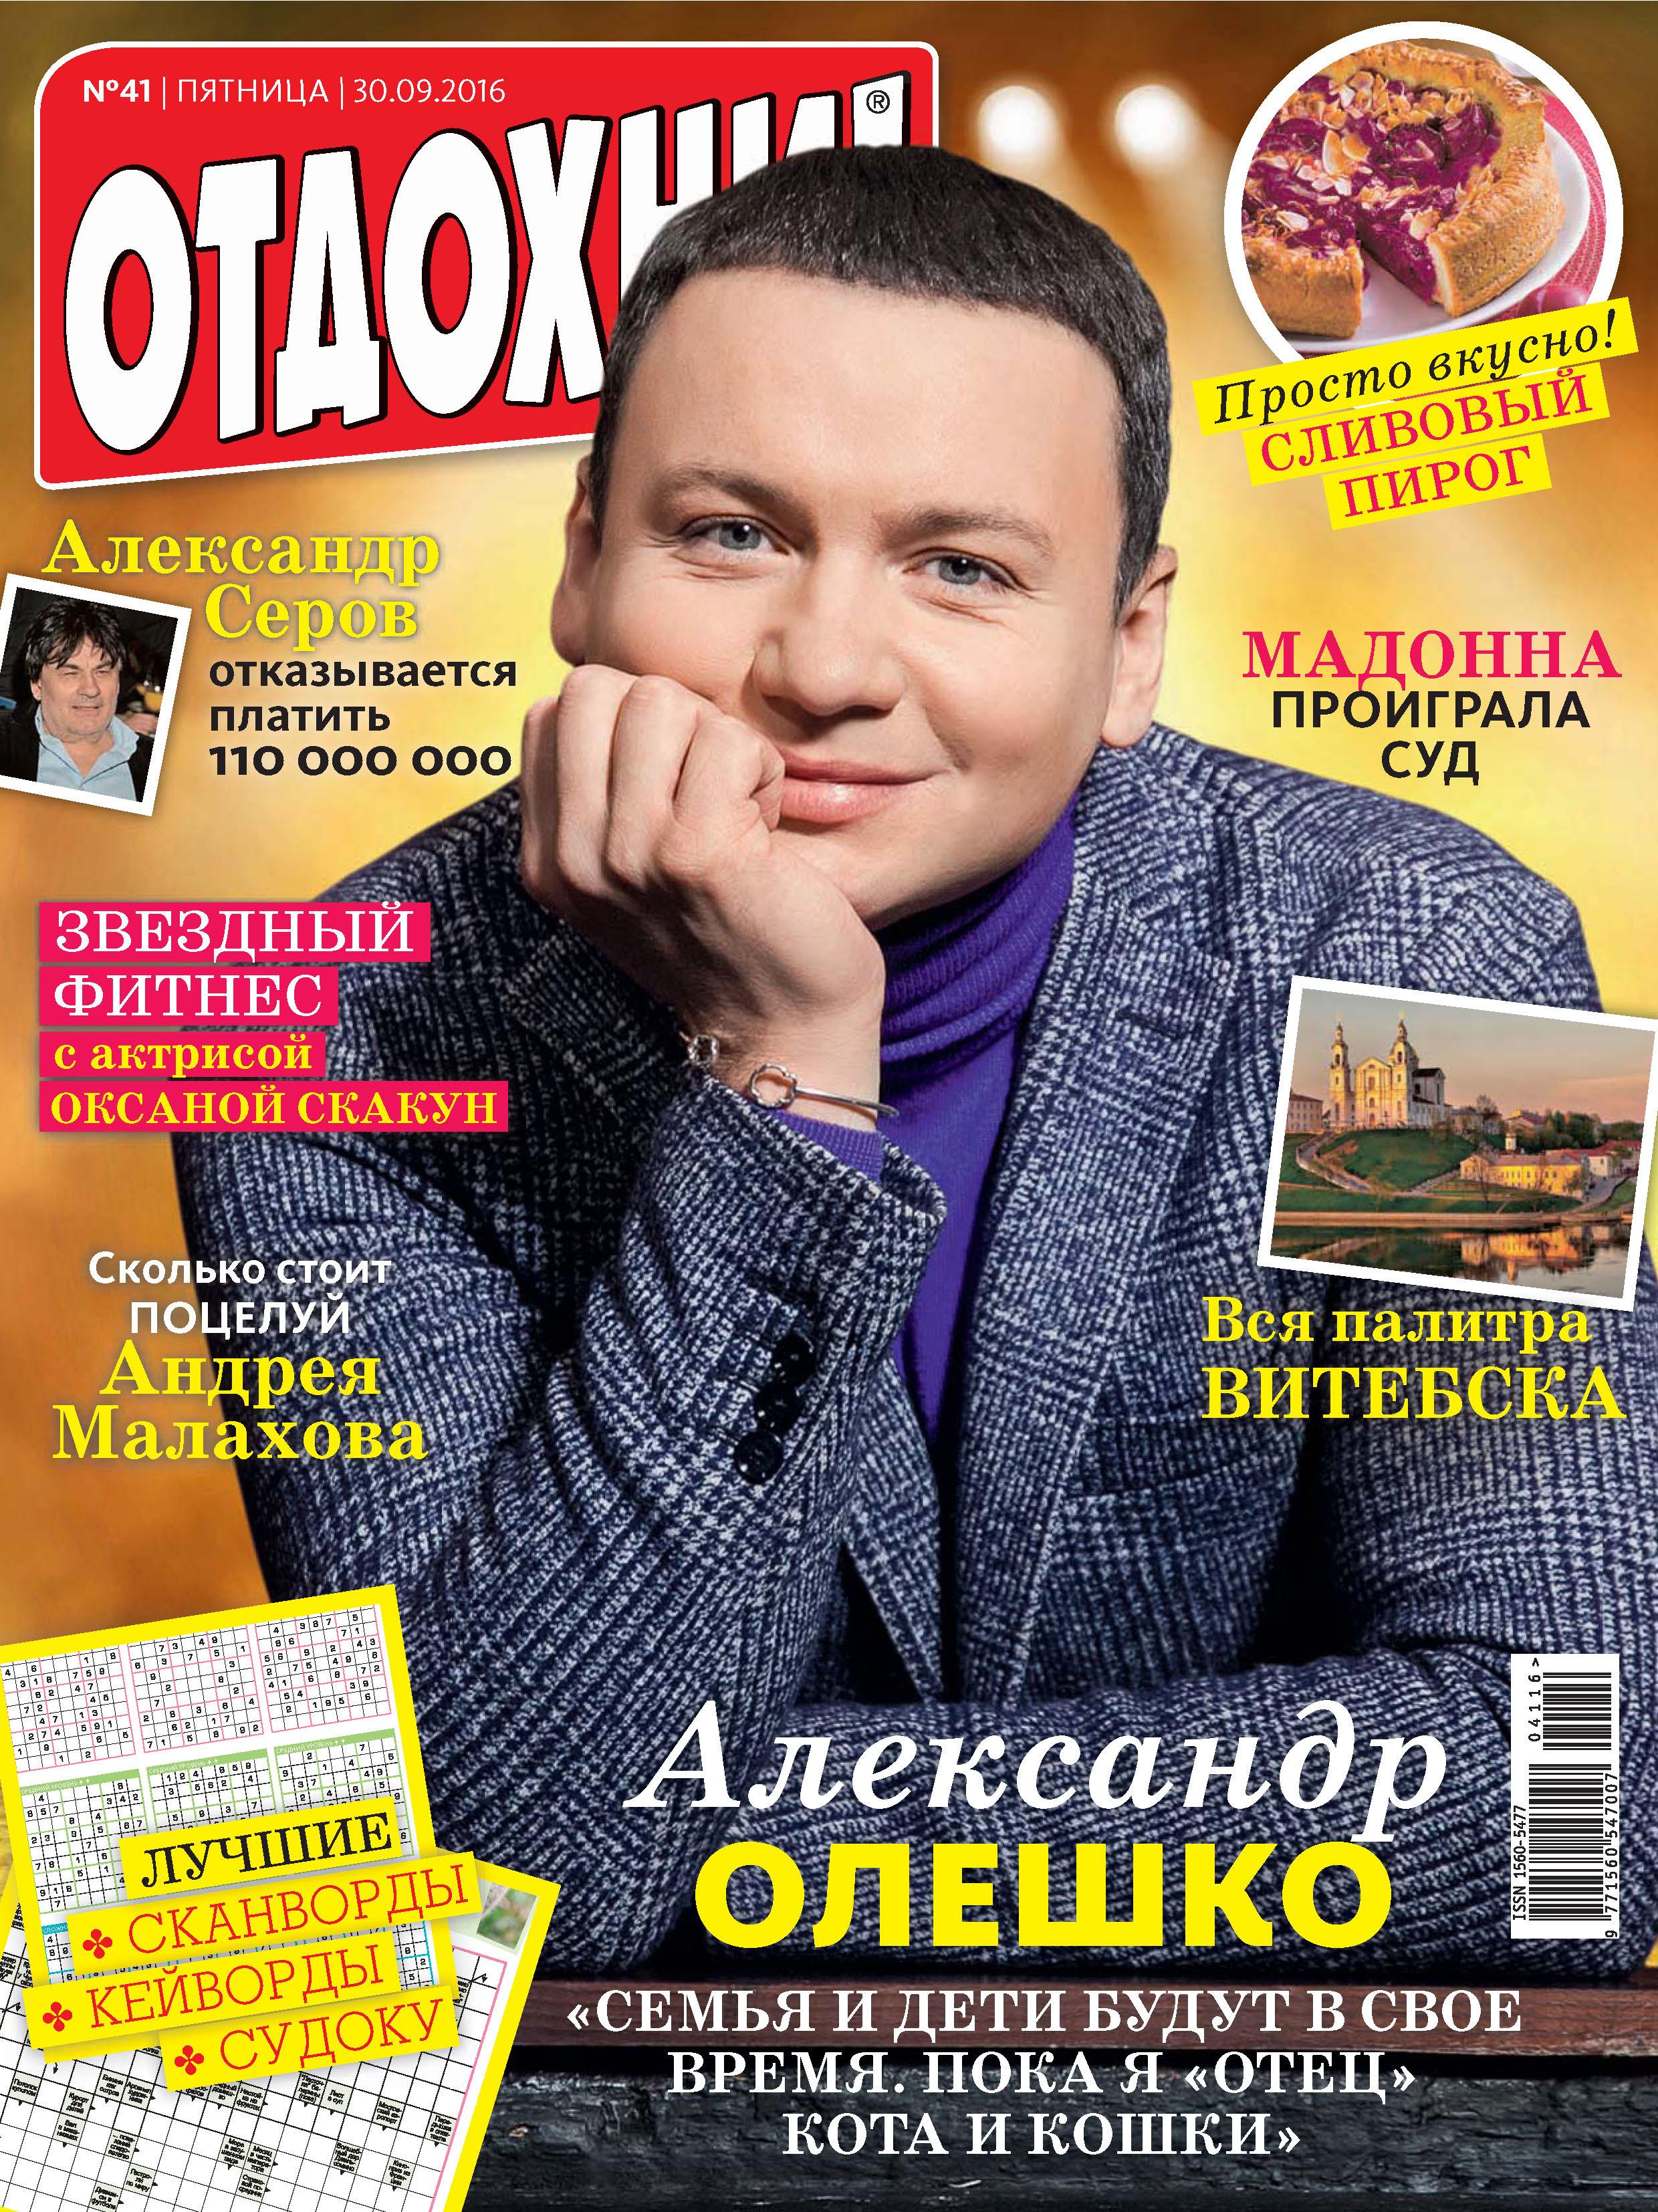 ИД «Бурда» Журнал «Отдохни!» №41/2016 ид бурда журнал отдохни 40 2016